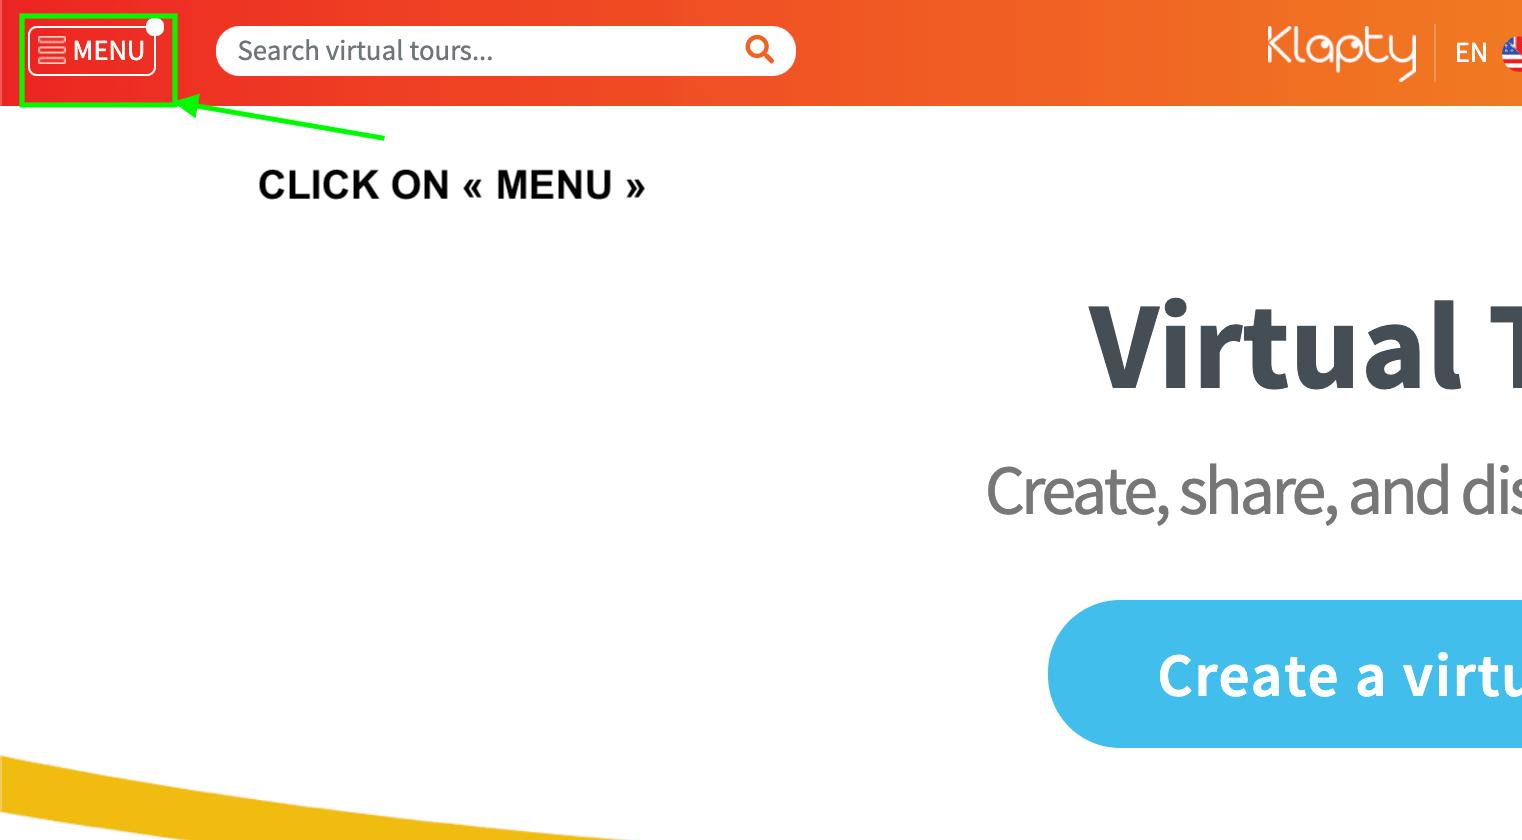 Update/edit or delete a Klapty 360 virtual tour